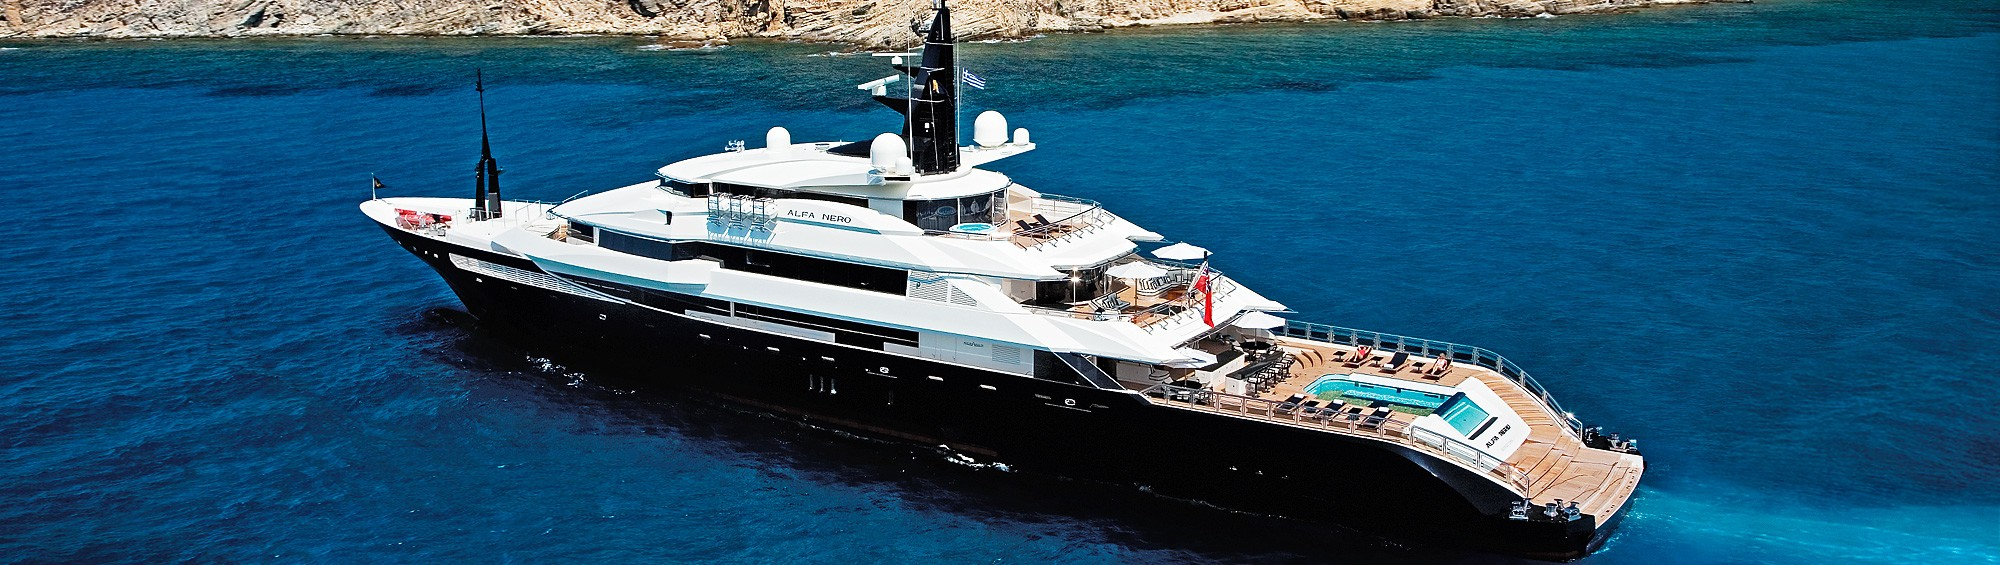 Antarctic yacht charter